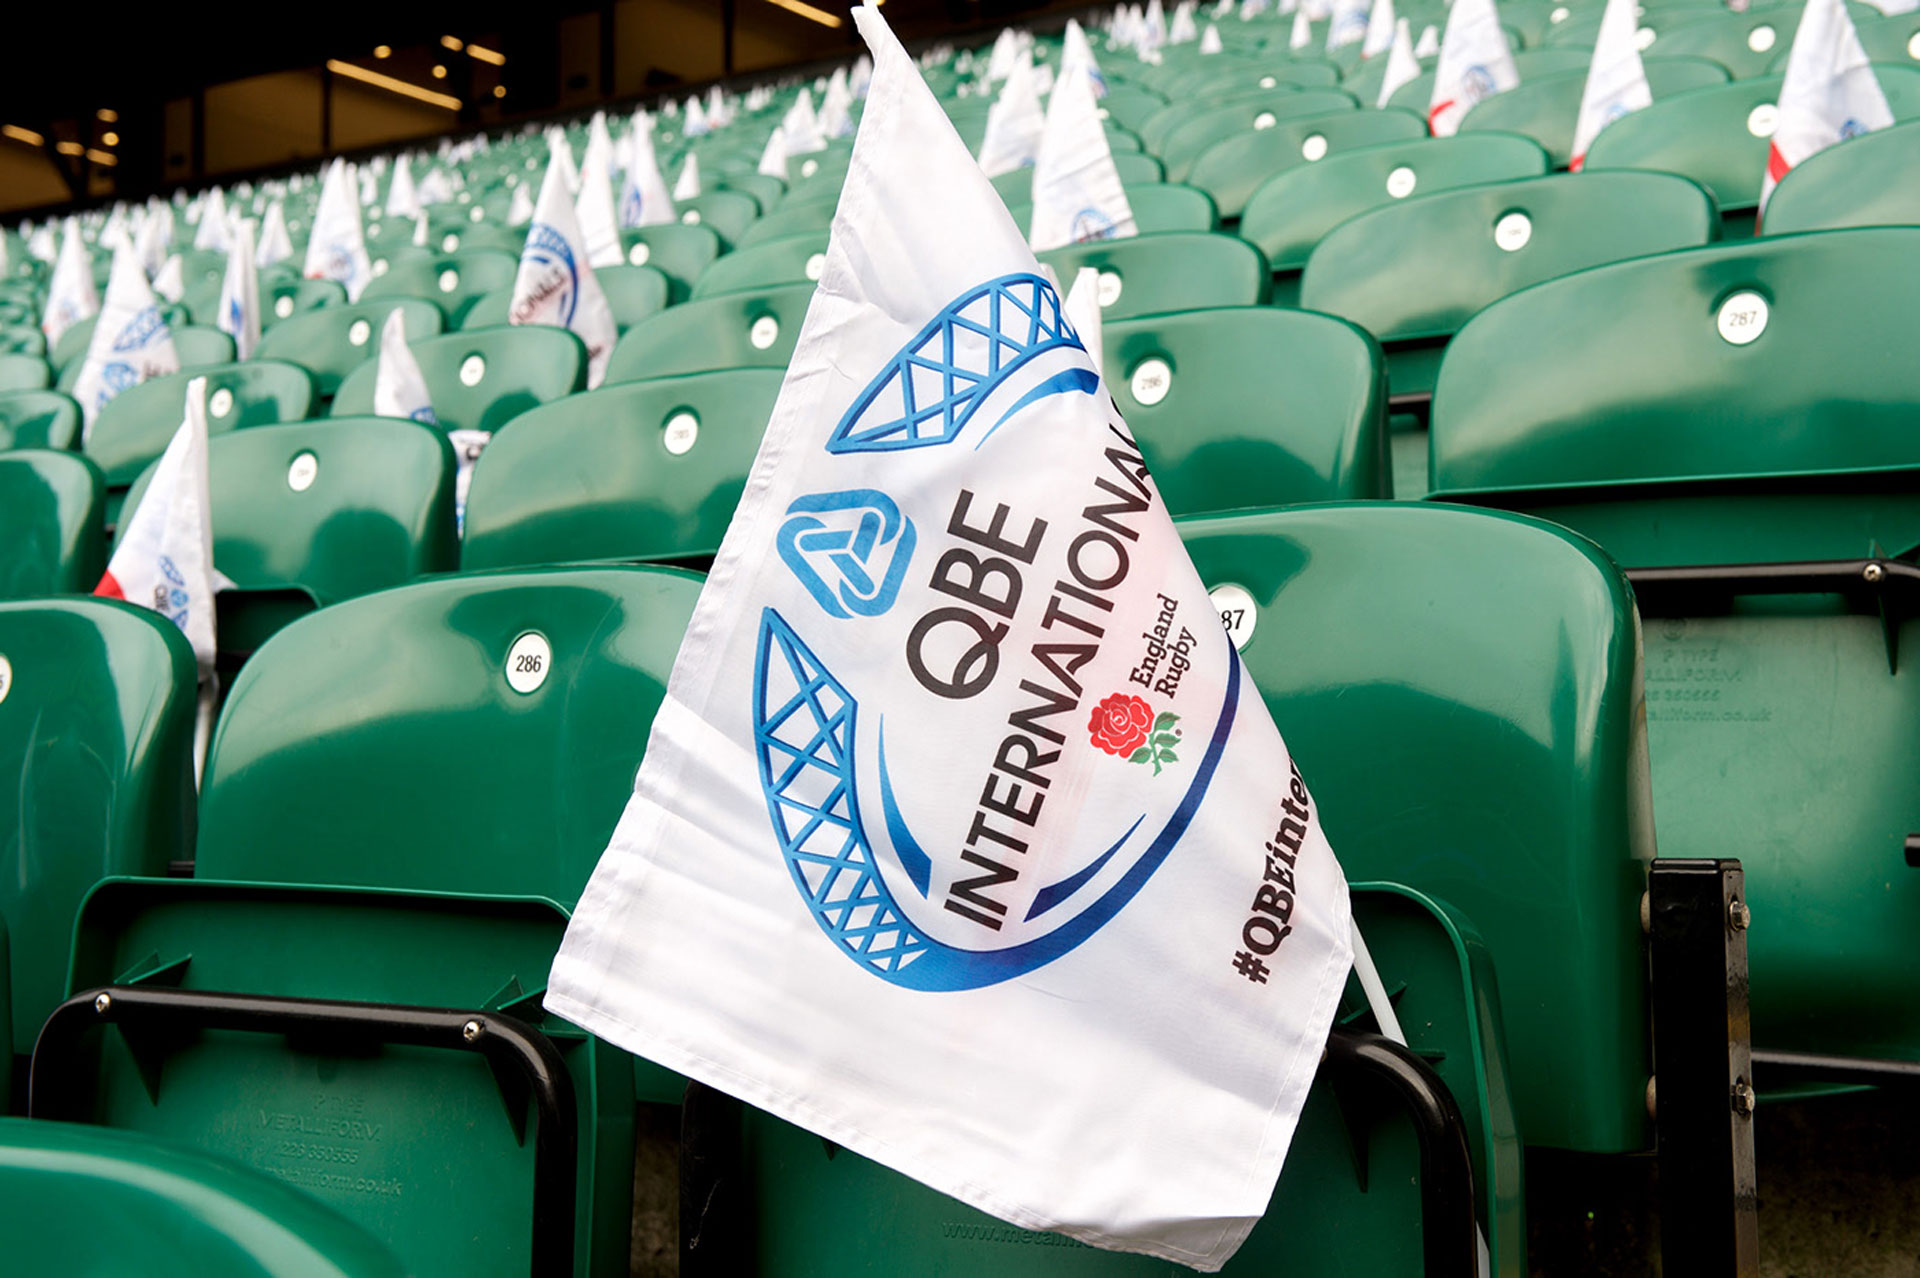 Glendale Creative QBE Internationals Rugby Twickenham Seat Flags